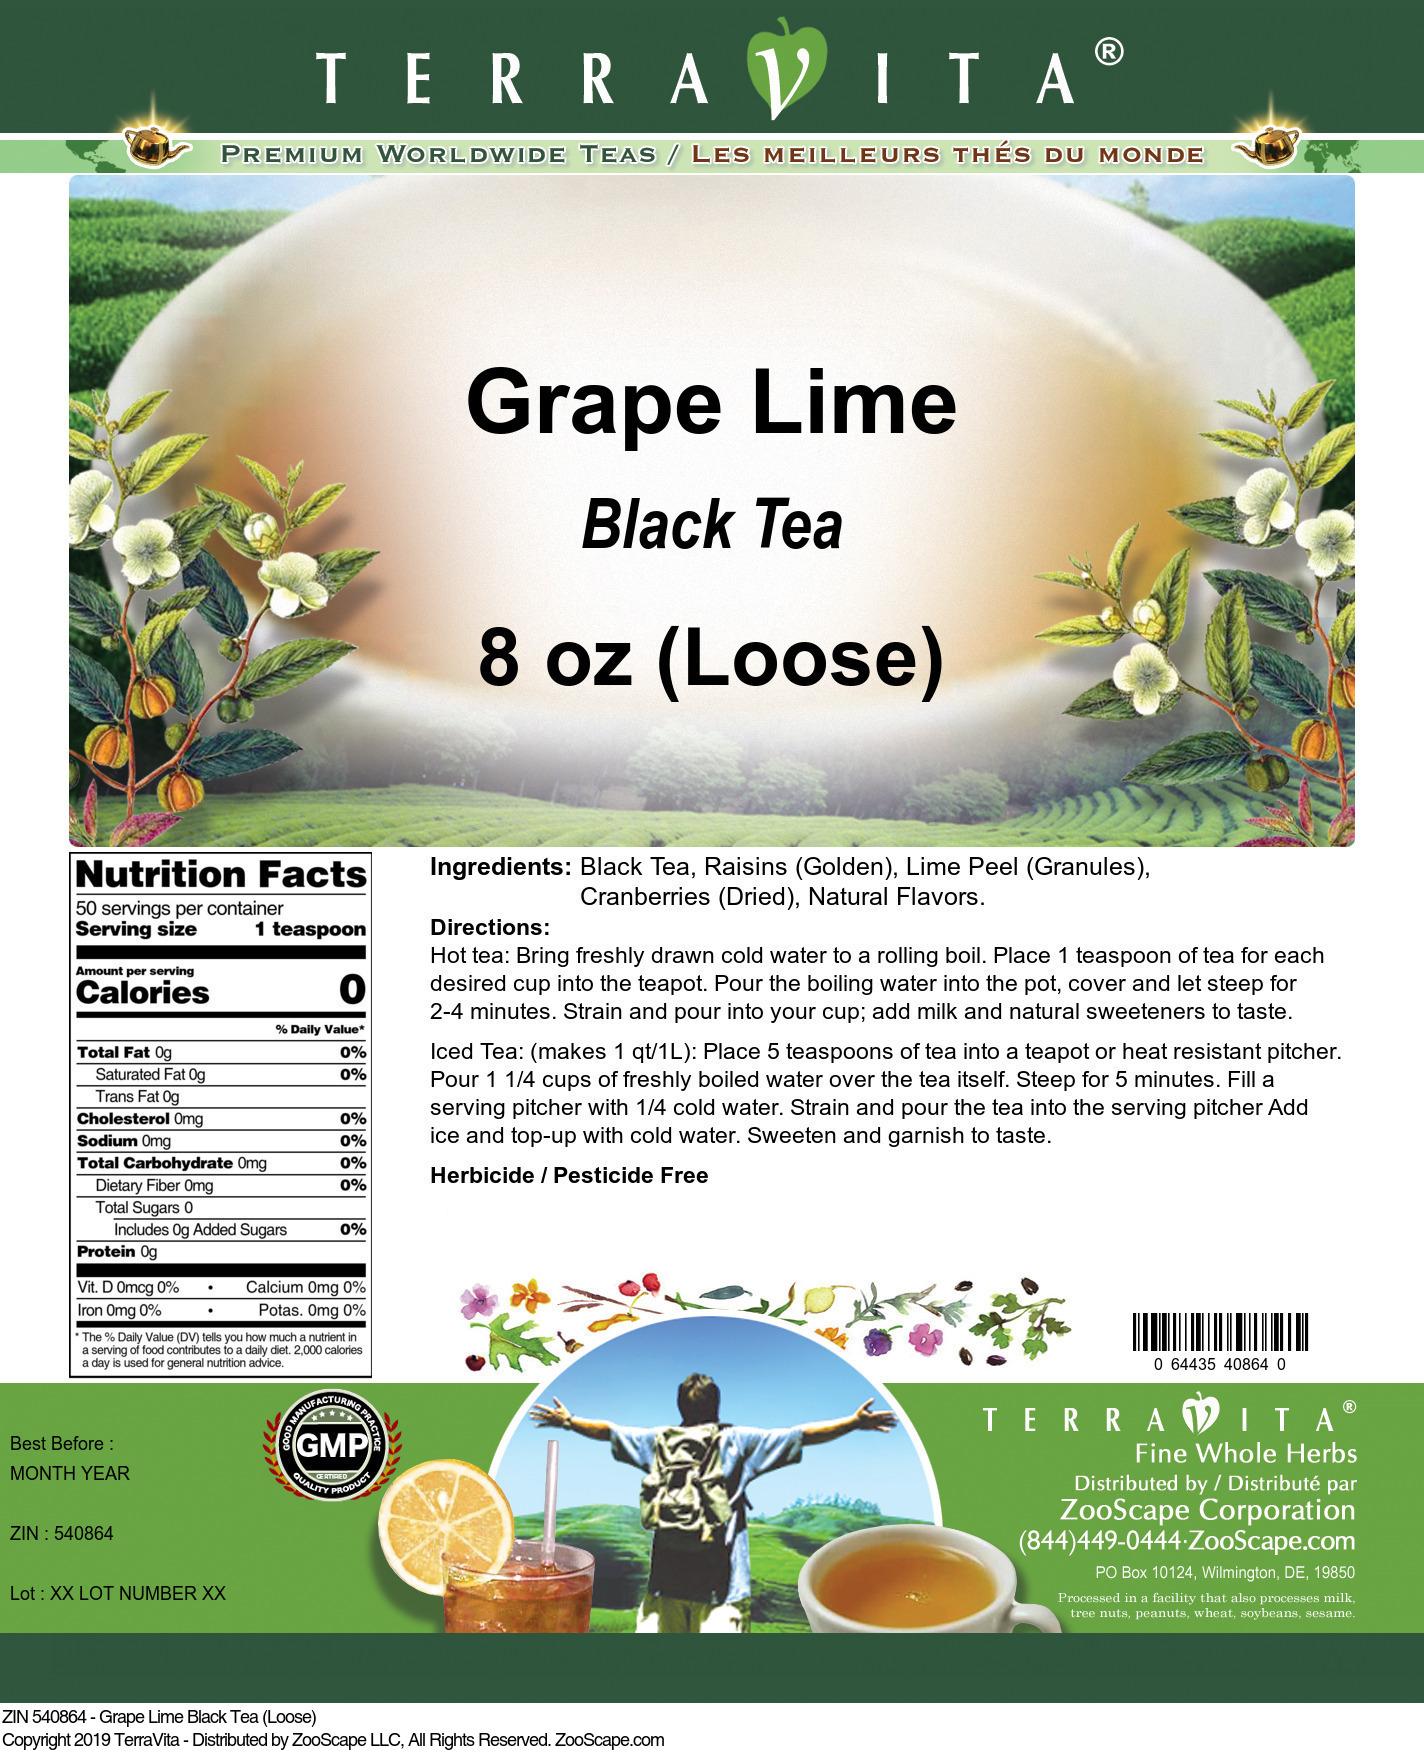 Grape Lime Black Tea